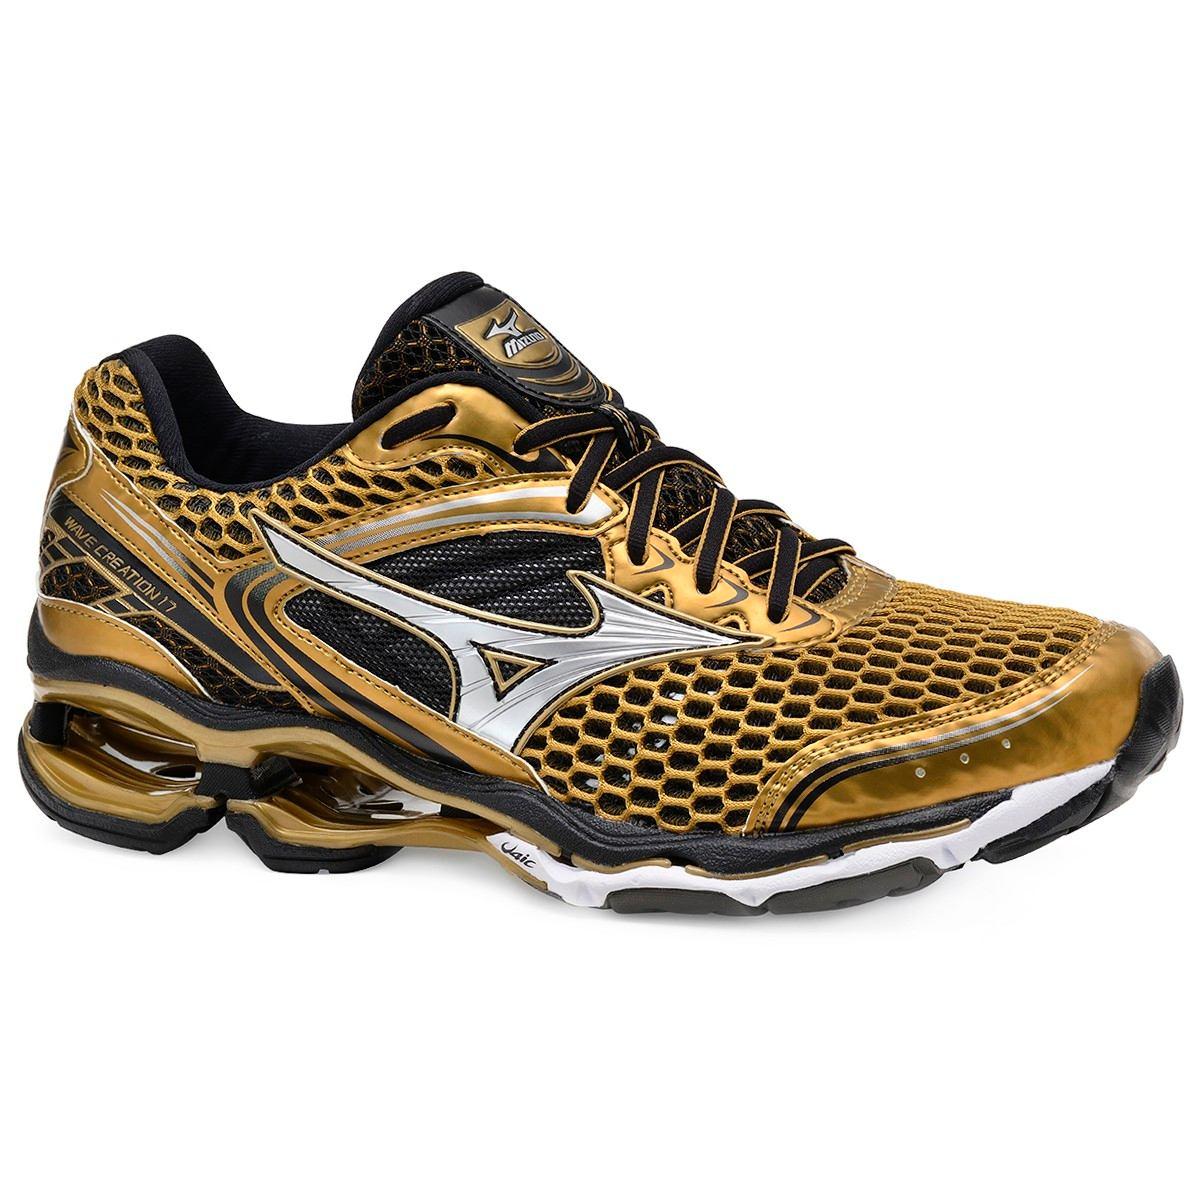 199e38f471 Mizuno Wave Creation 17 Golden Runners Homem E Mulher - R  449